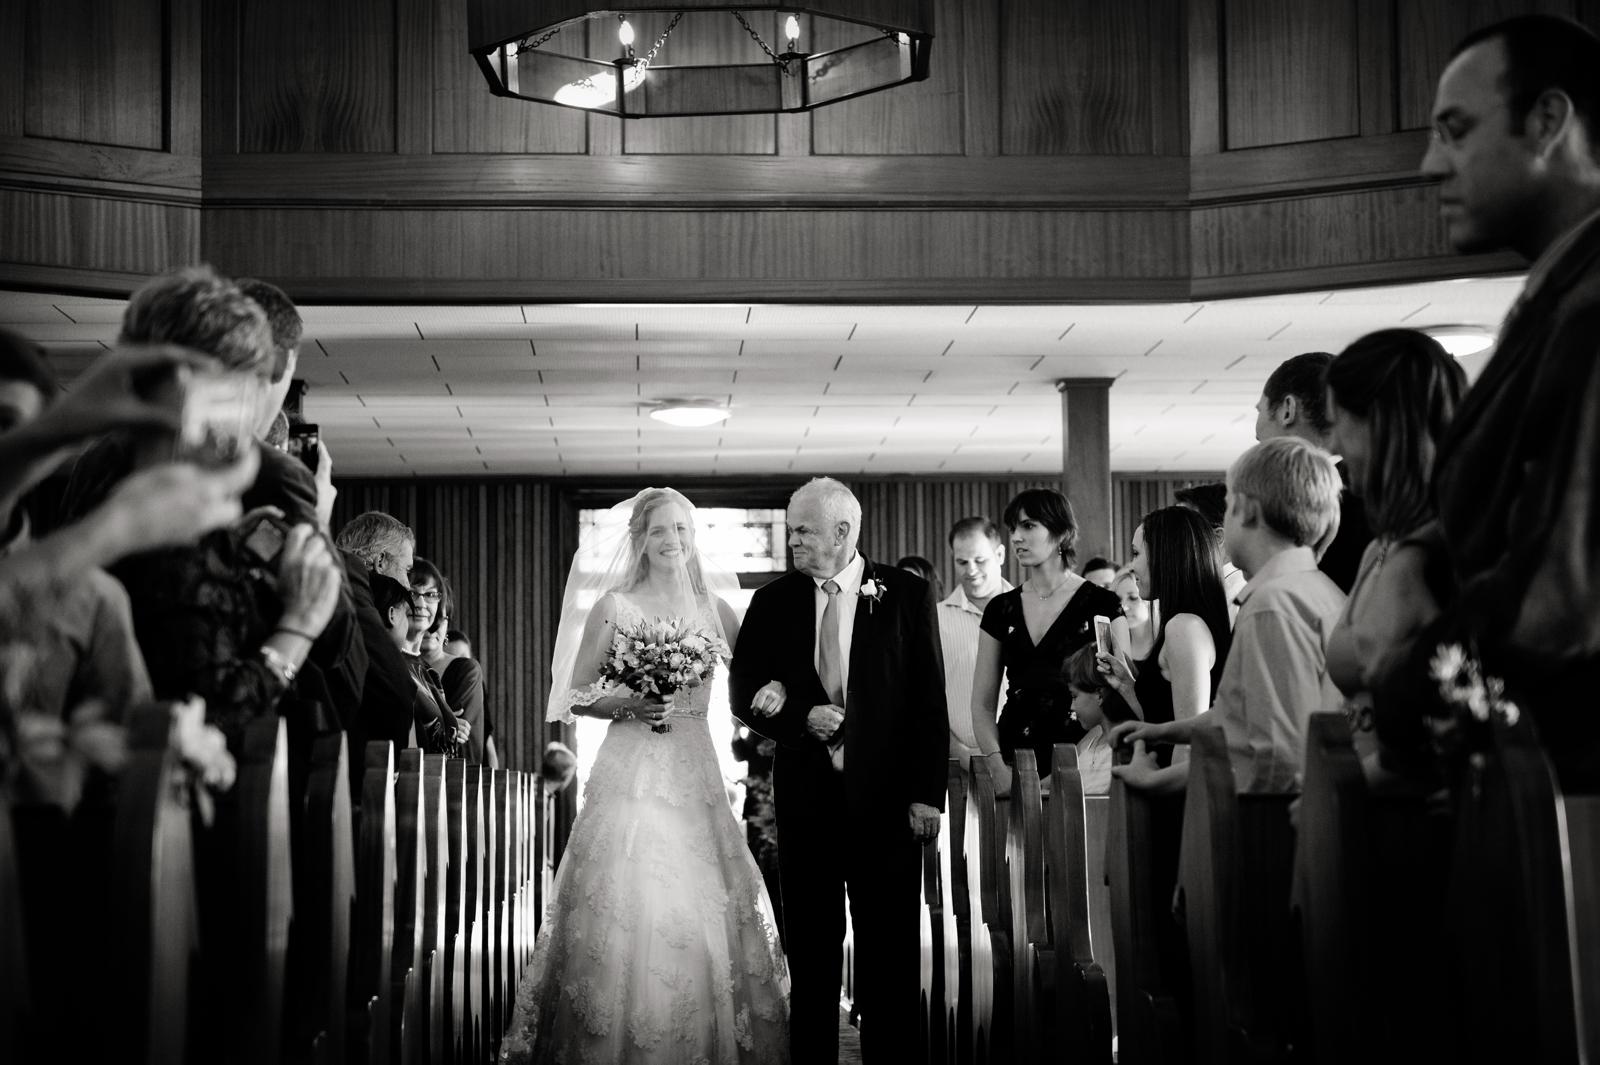 german bride down the aisle